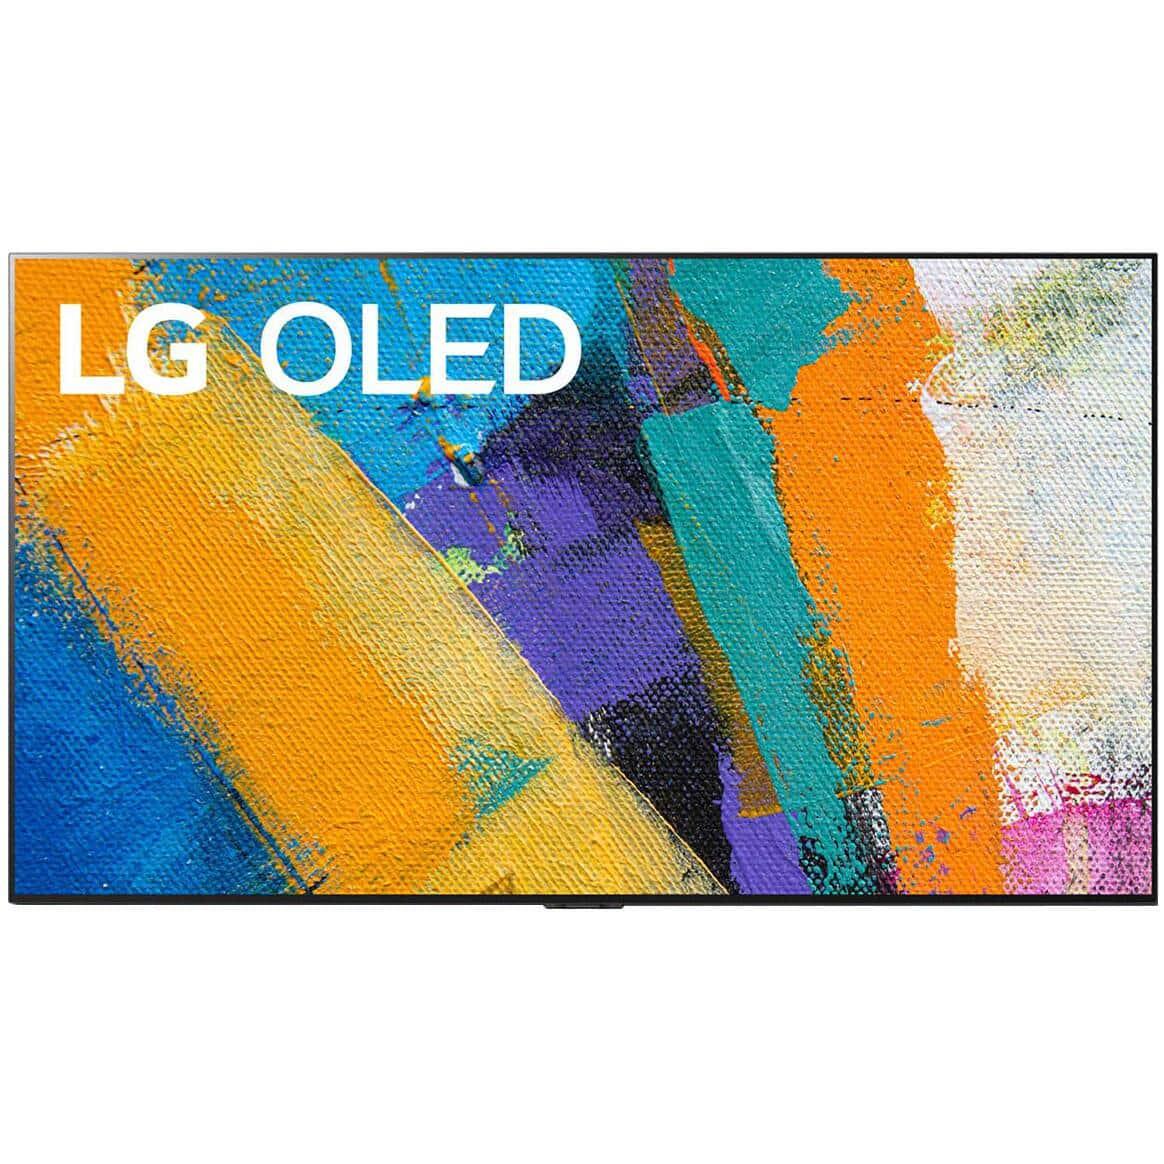 "77"" LG OLED77GXPUA OLED TV + $340 Visa GC + 4-Yr Warranty w/ Burn-in Coverage"